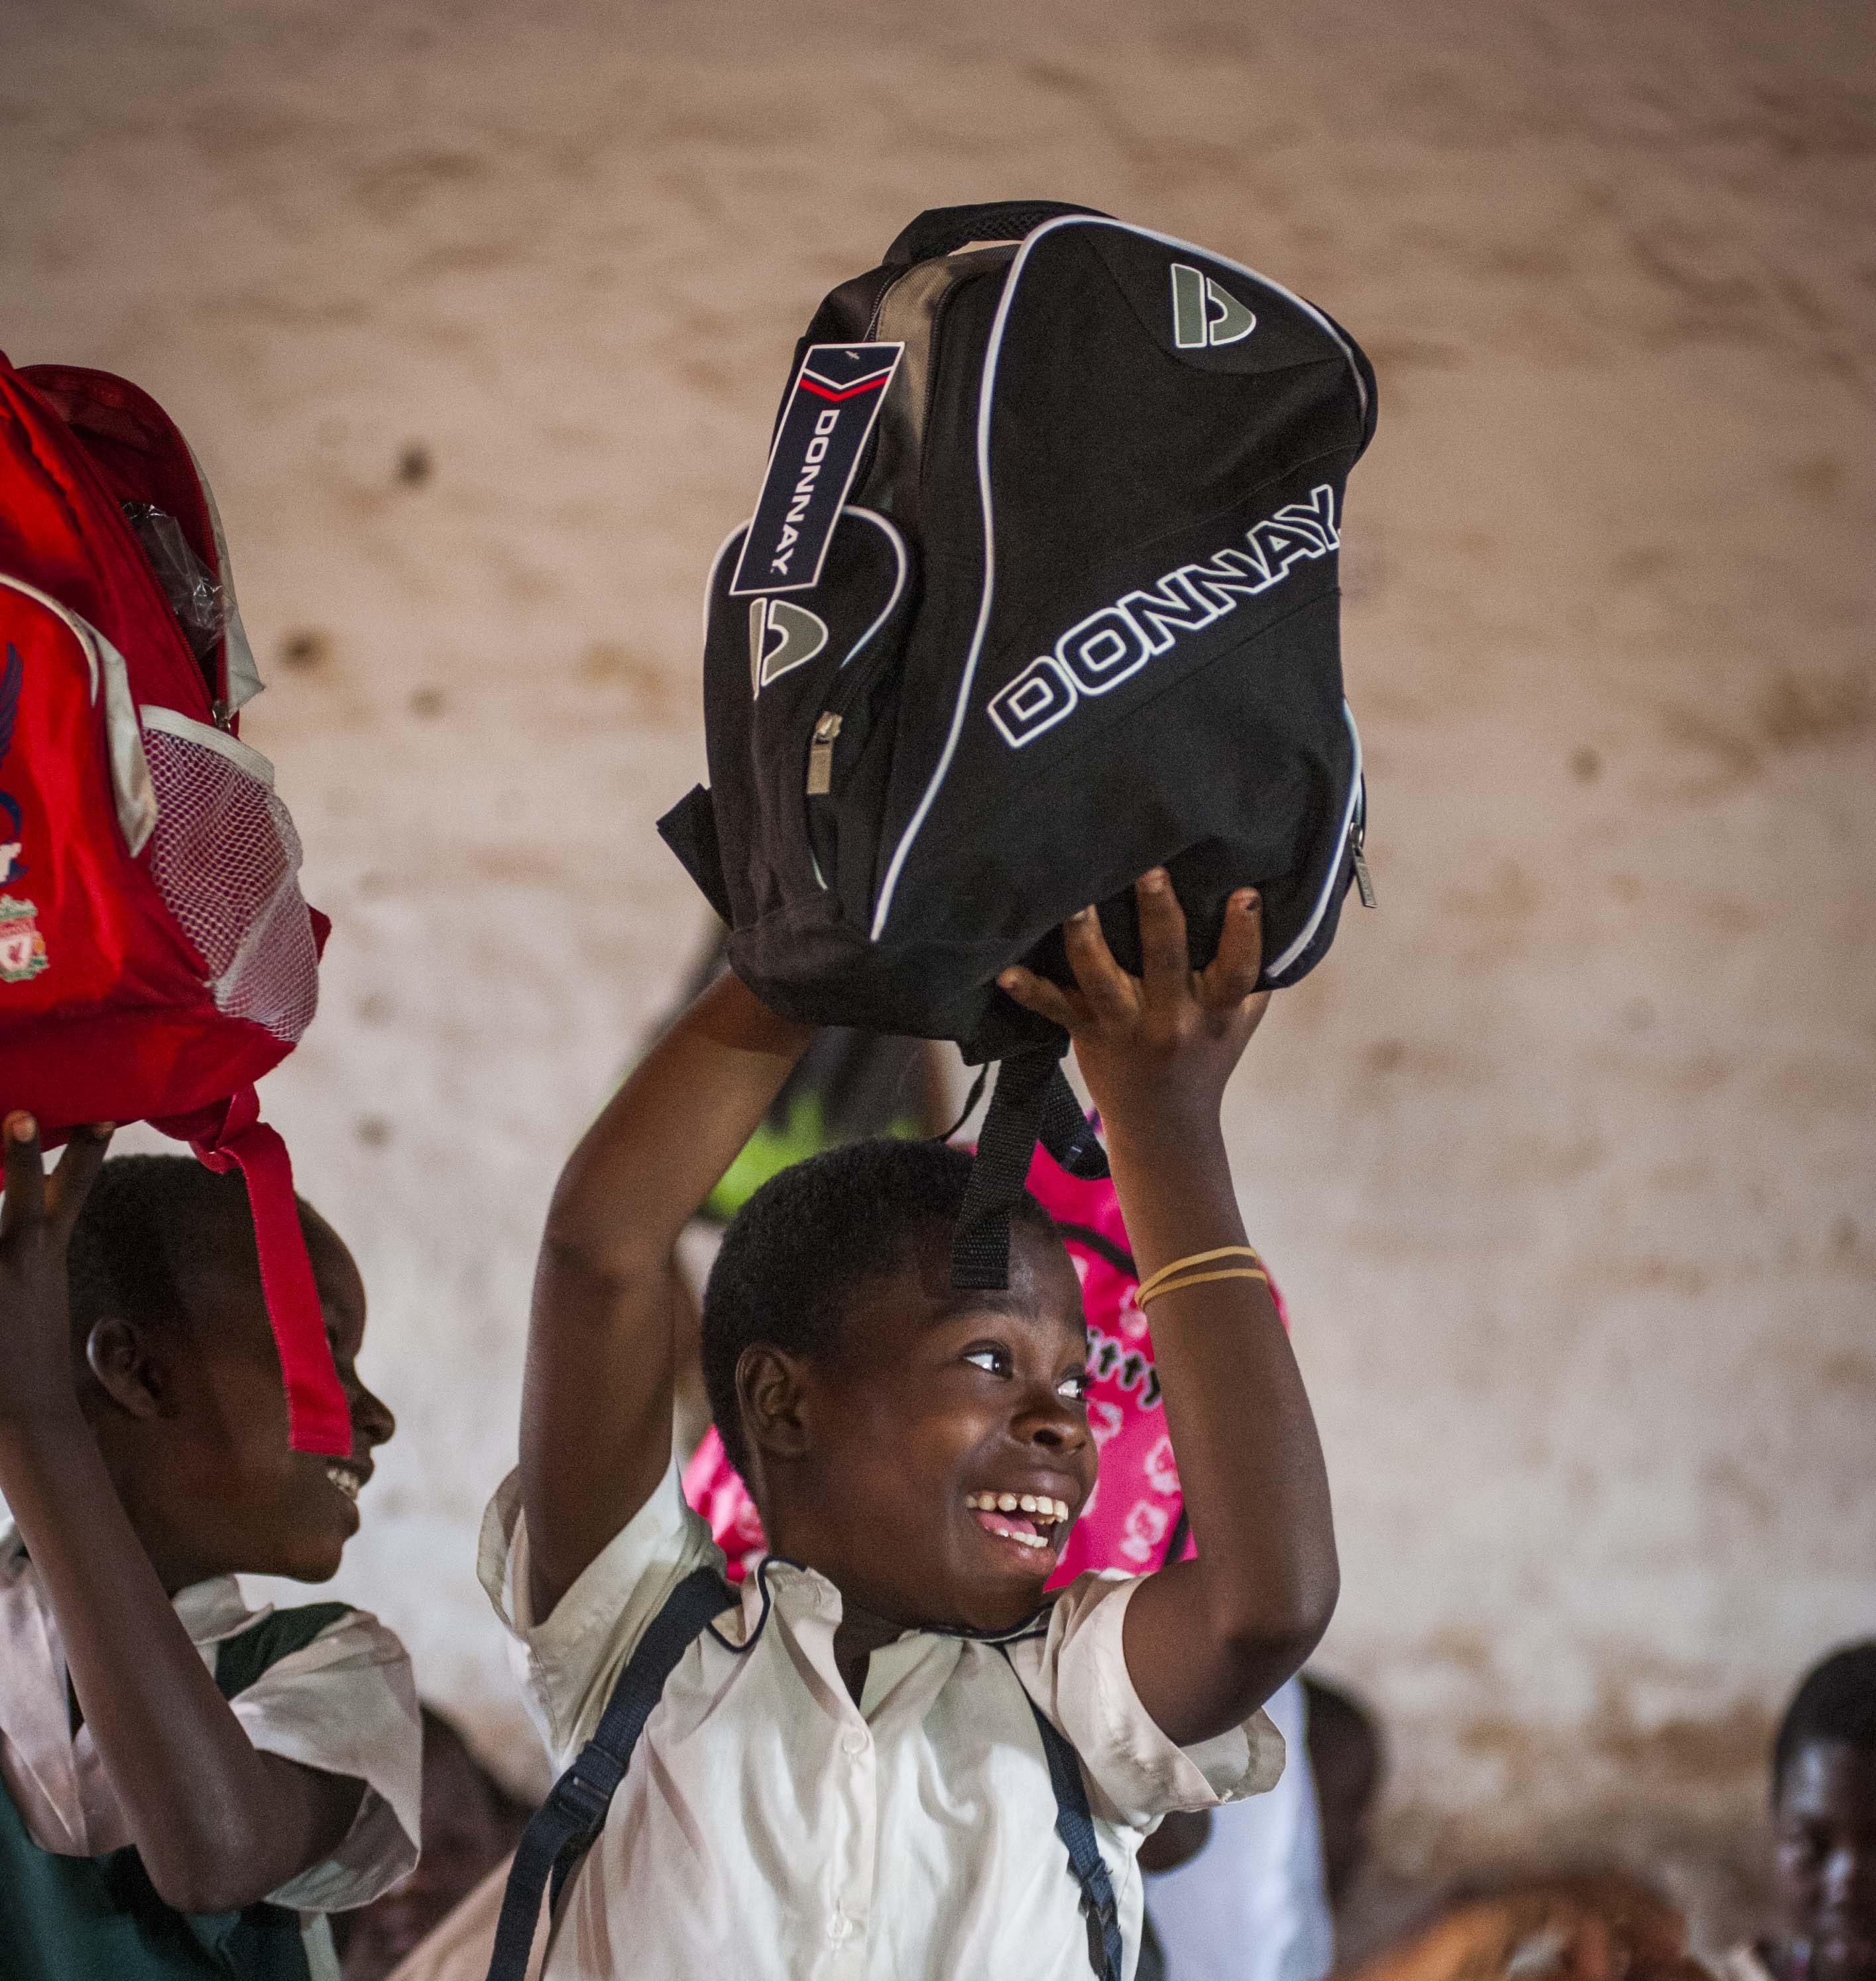 Children in Malawi receiving backpacks